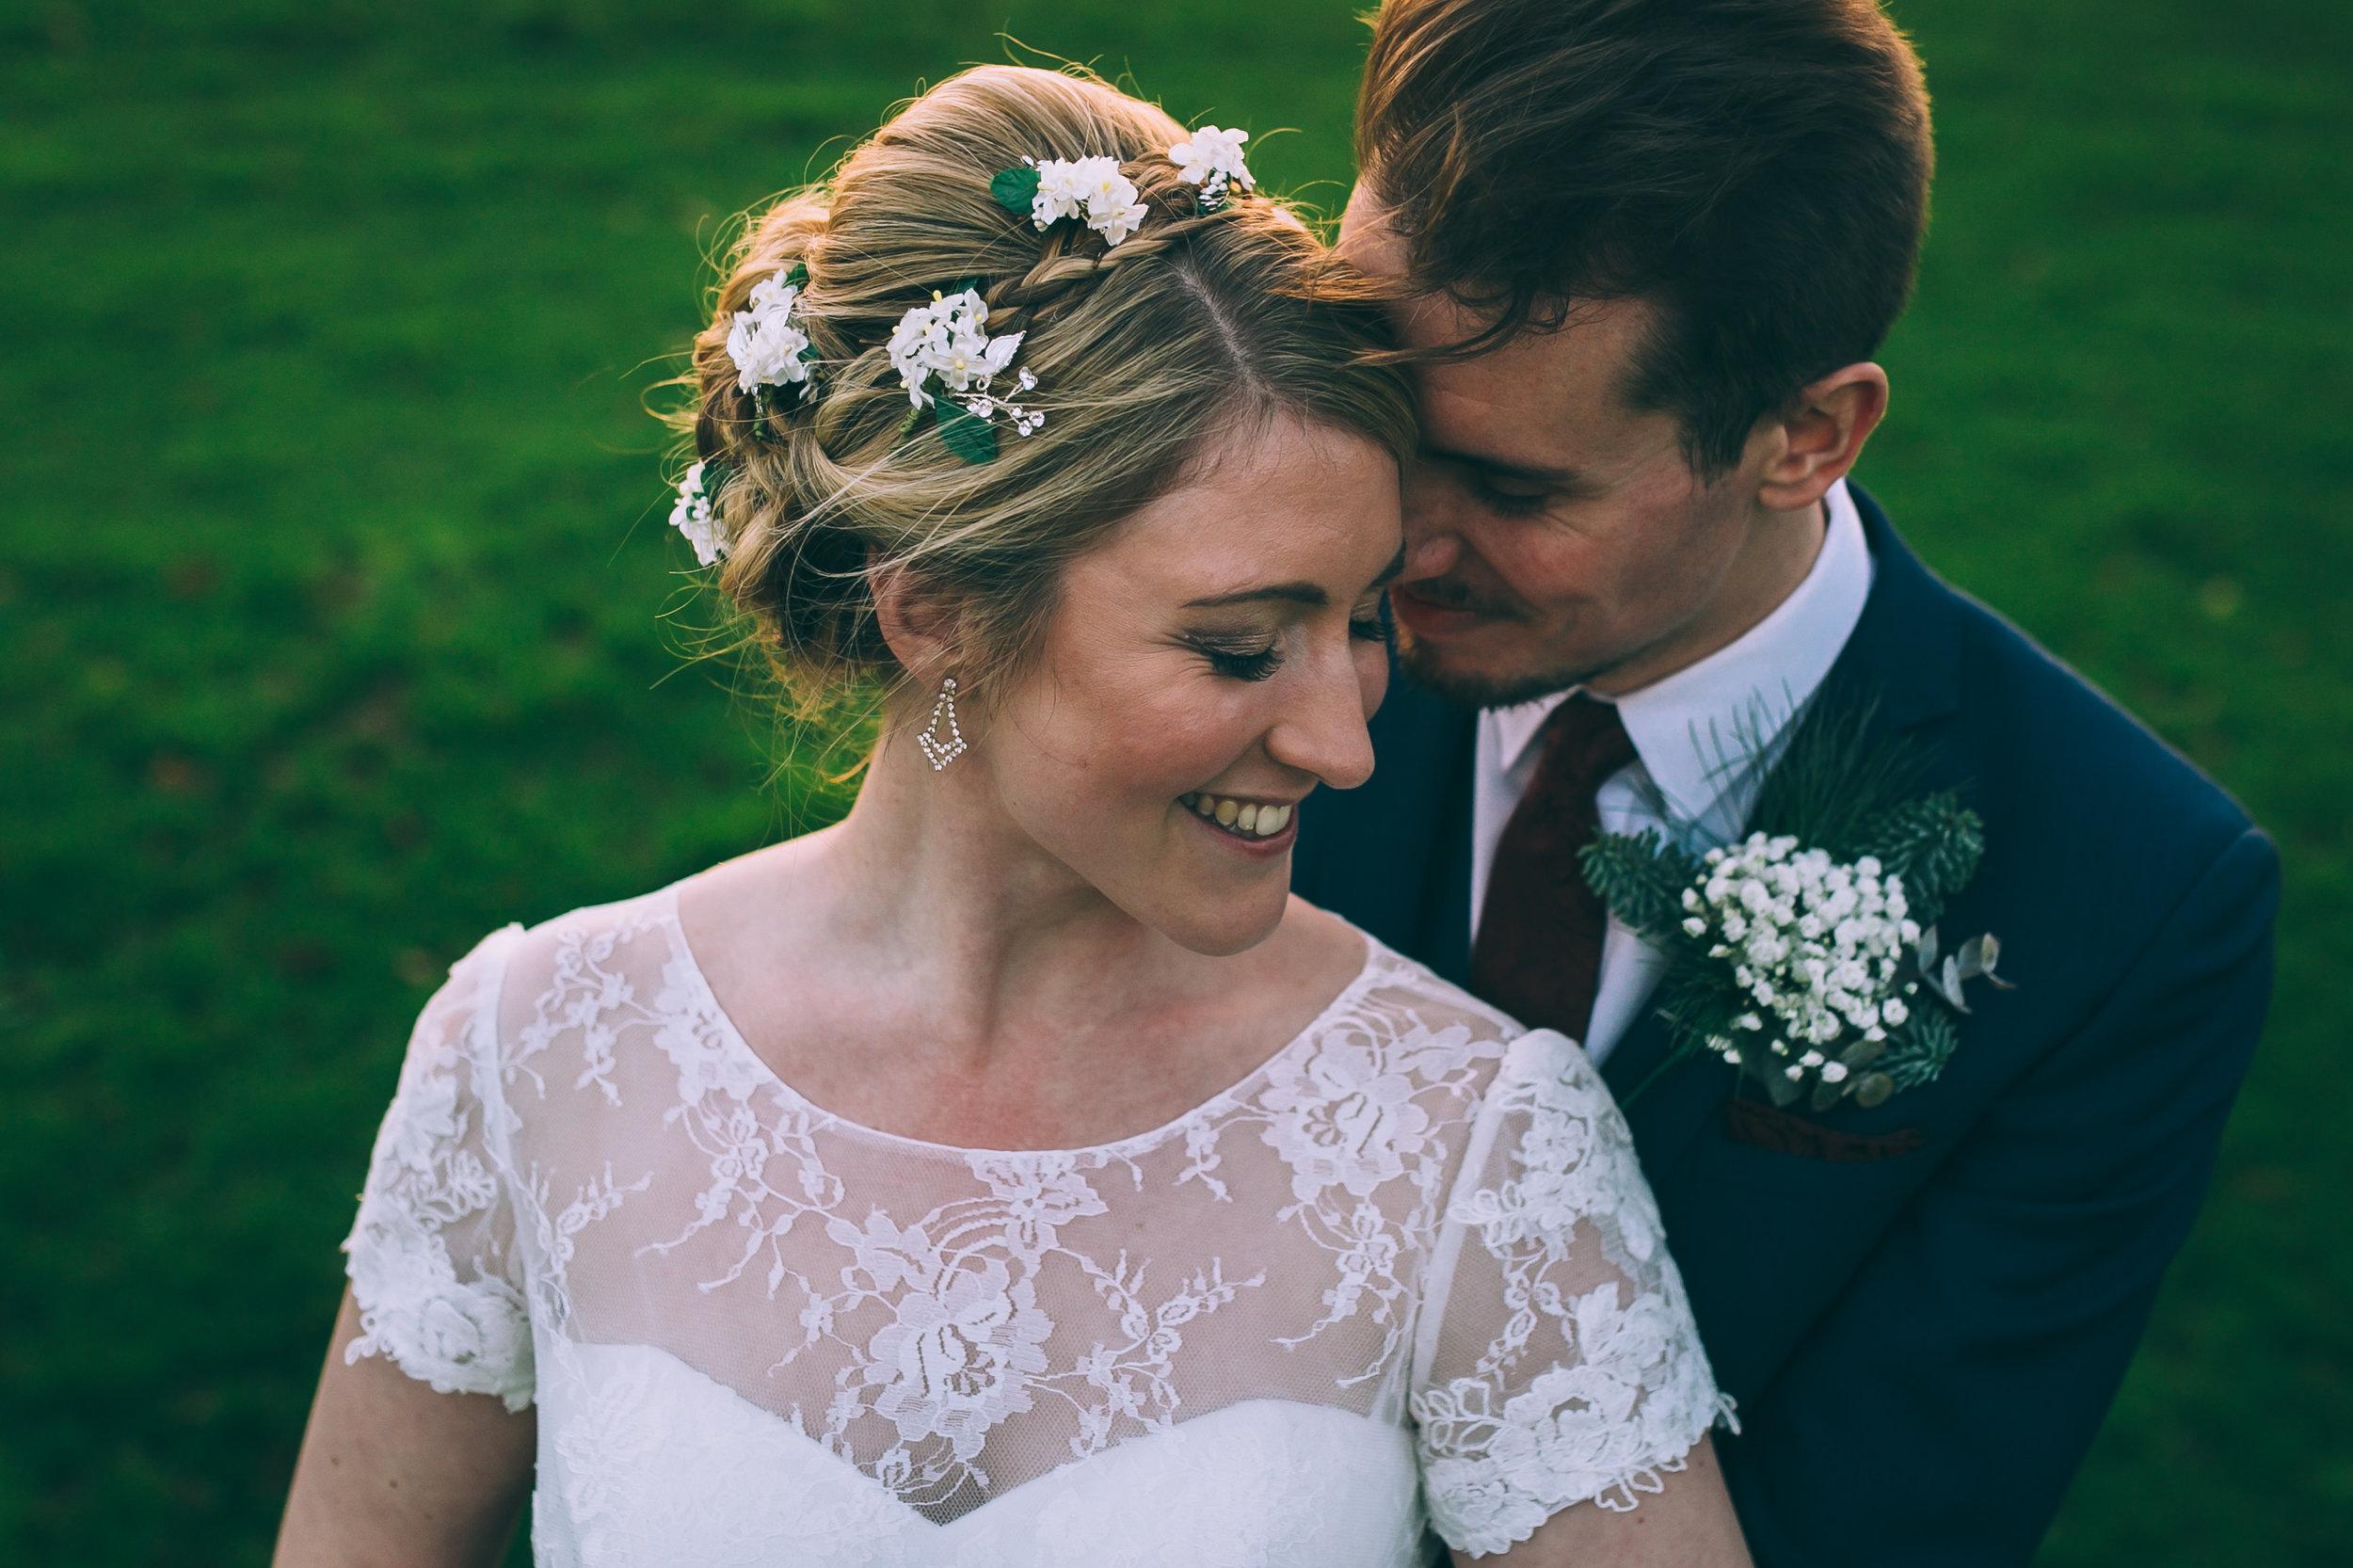 Clare&Iain-Wedding-at-The-Oak-Tree-Over-tom-biddle-photographer-tb279.jpg